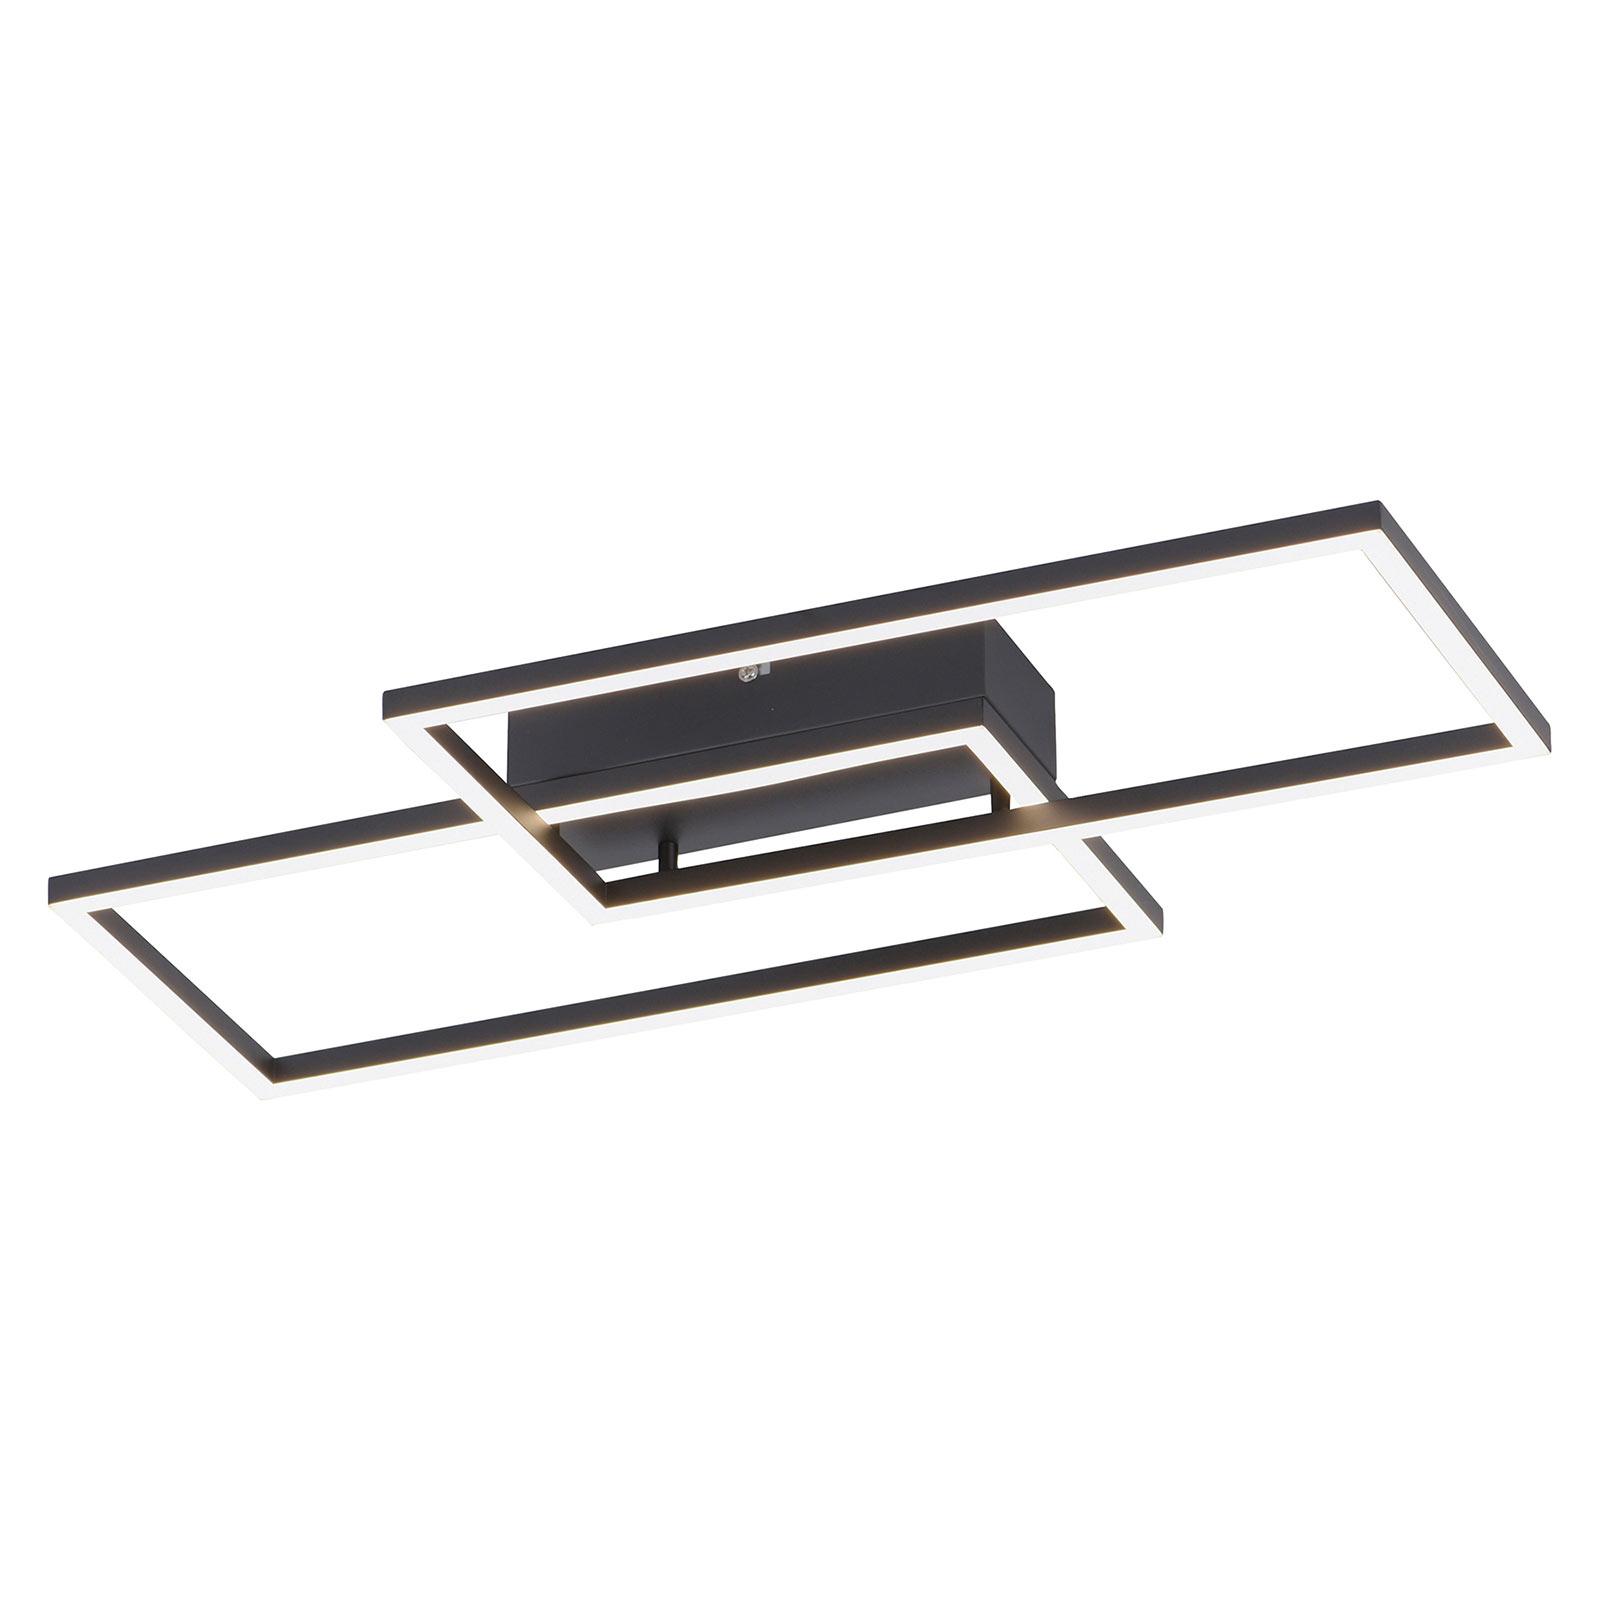 Lampa sufitowa LED Iven, czarna 2-pkt. prostokąt